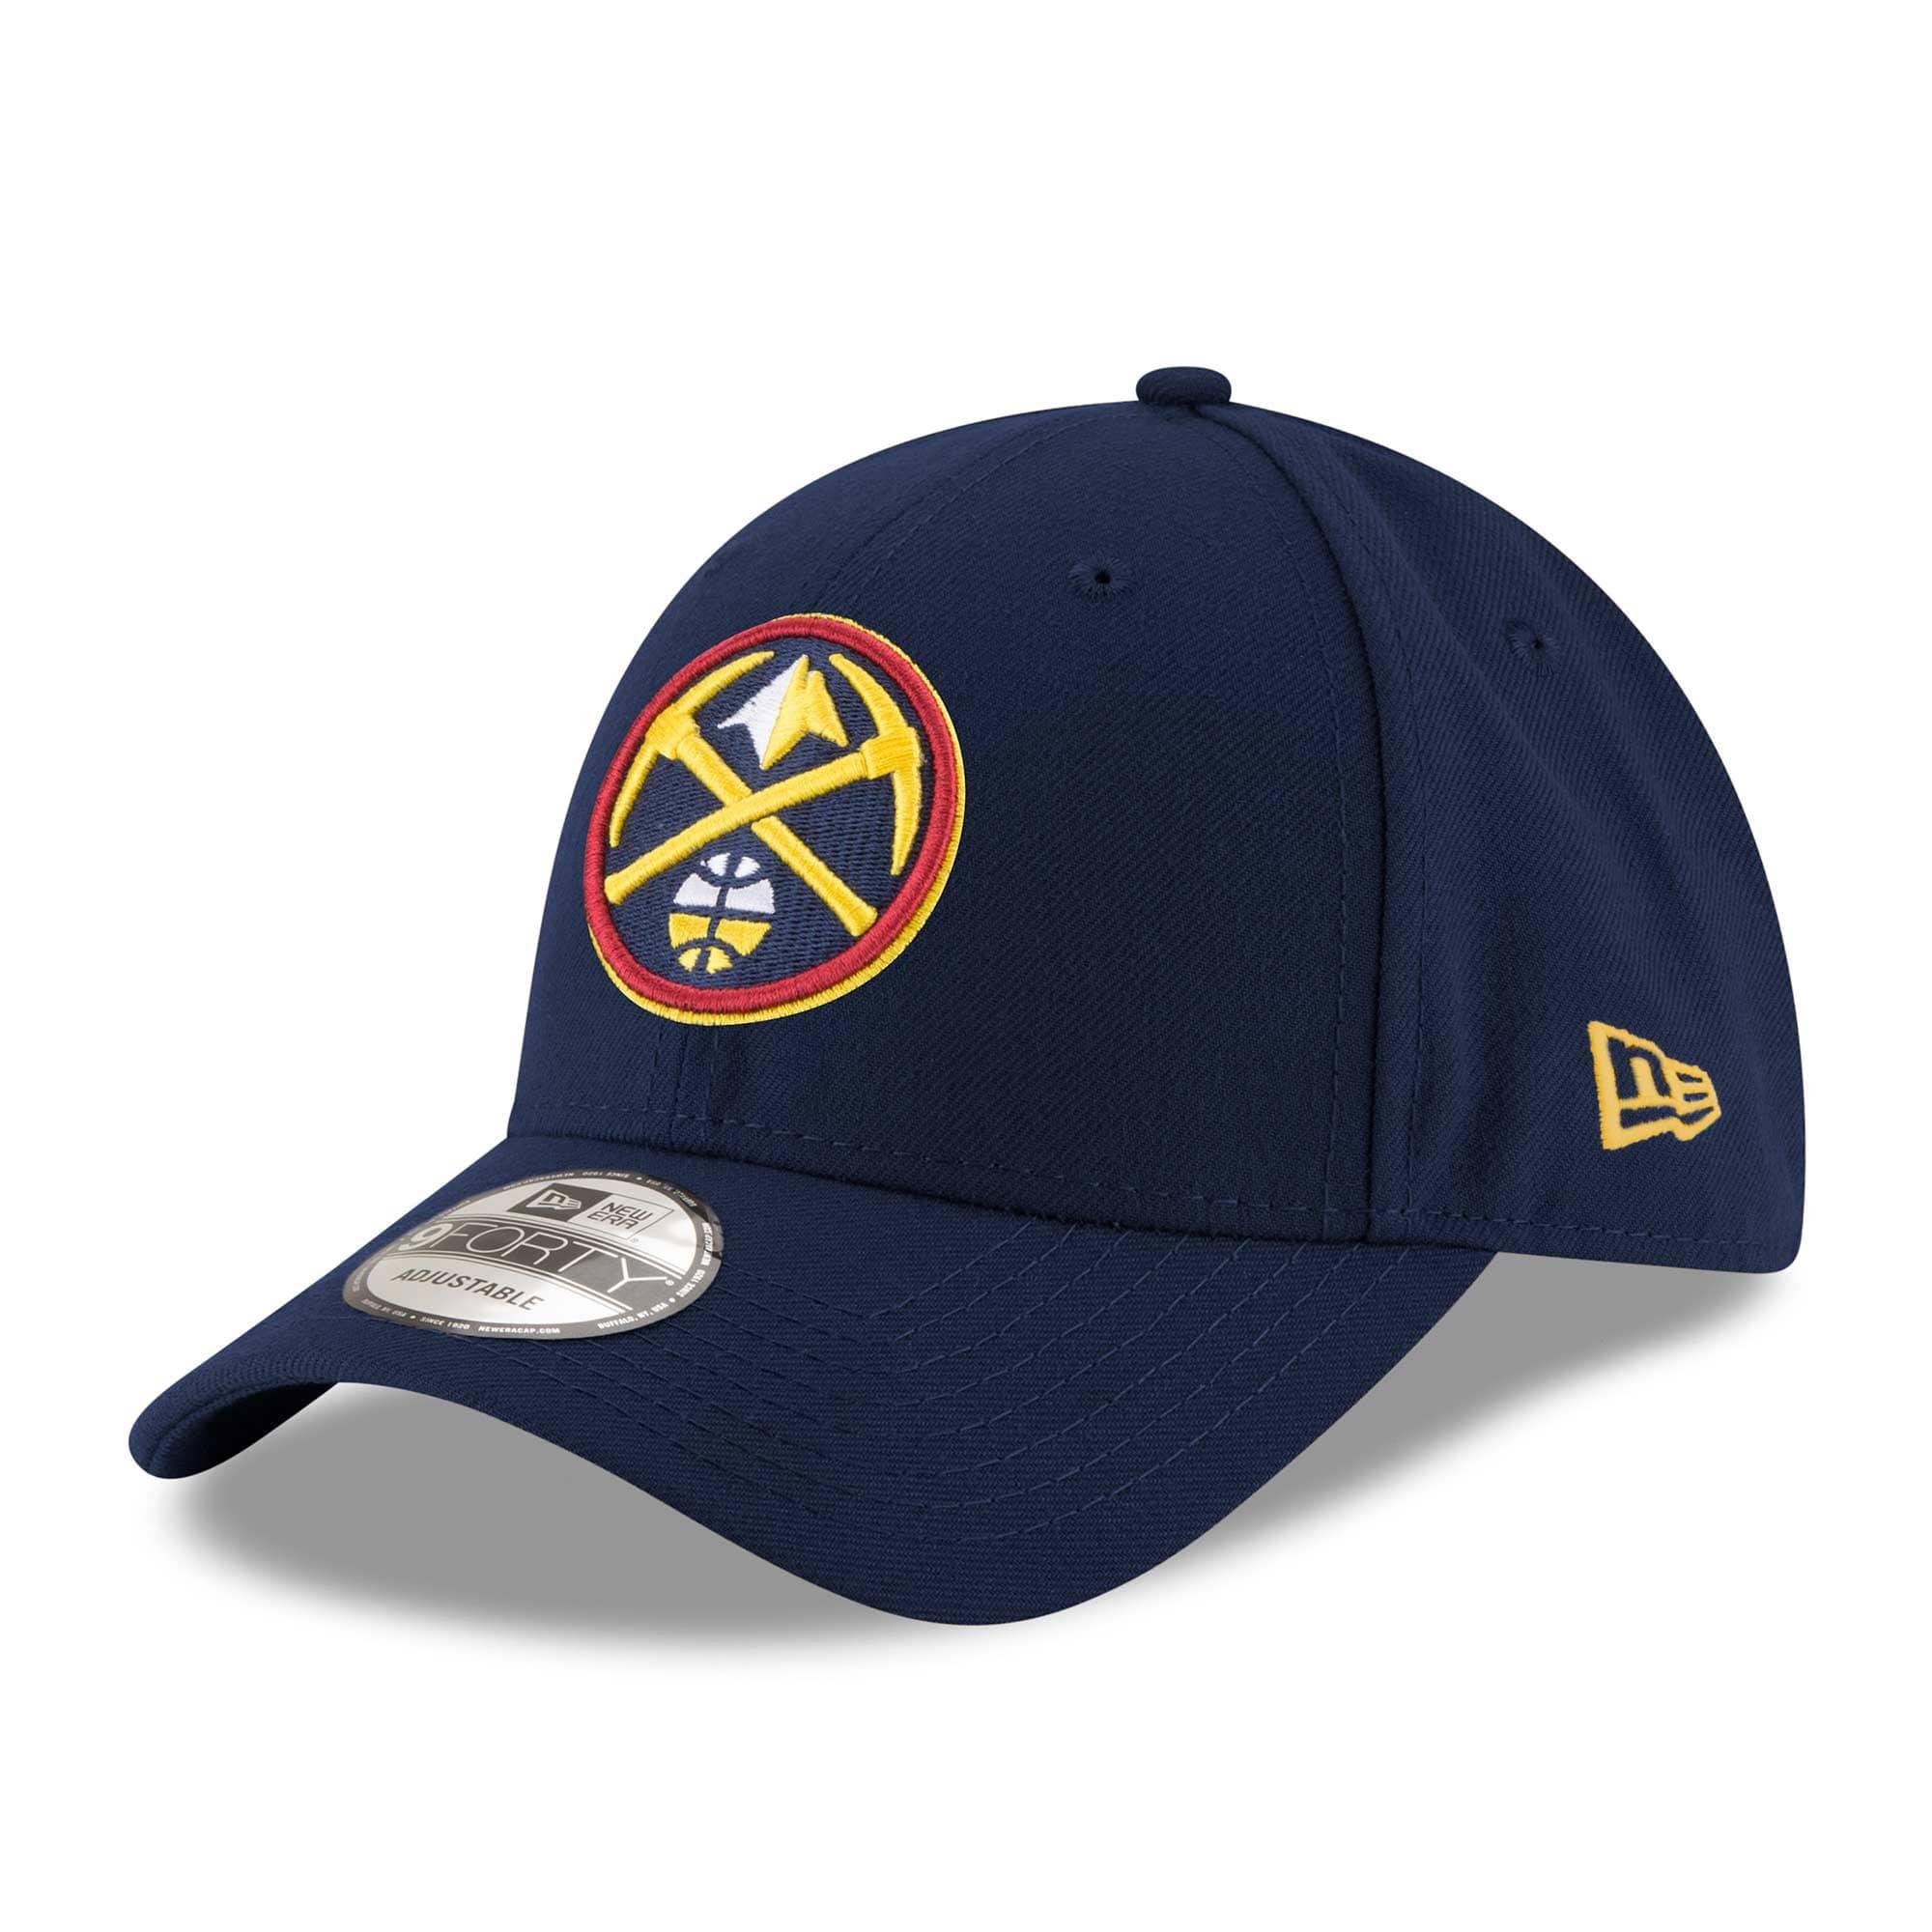 buy online d78ba 192a8 New Era Denver Nuggets The League Adjustable NBA Cap Navy   TAASS.com Fan  Shop